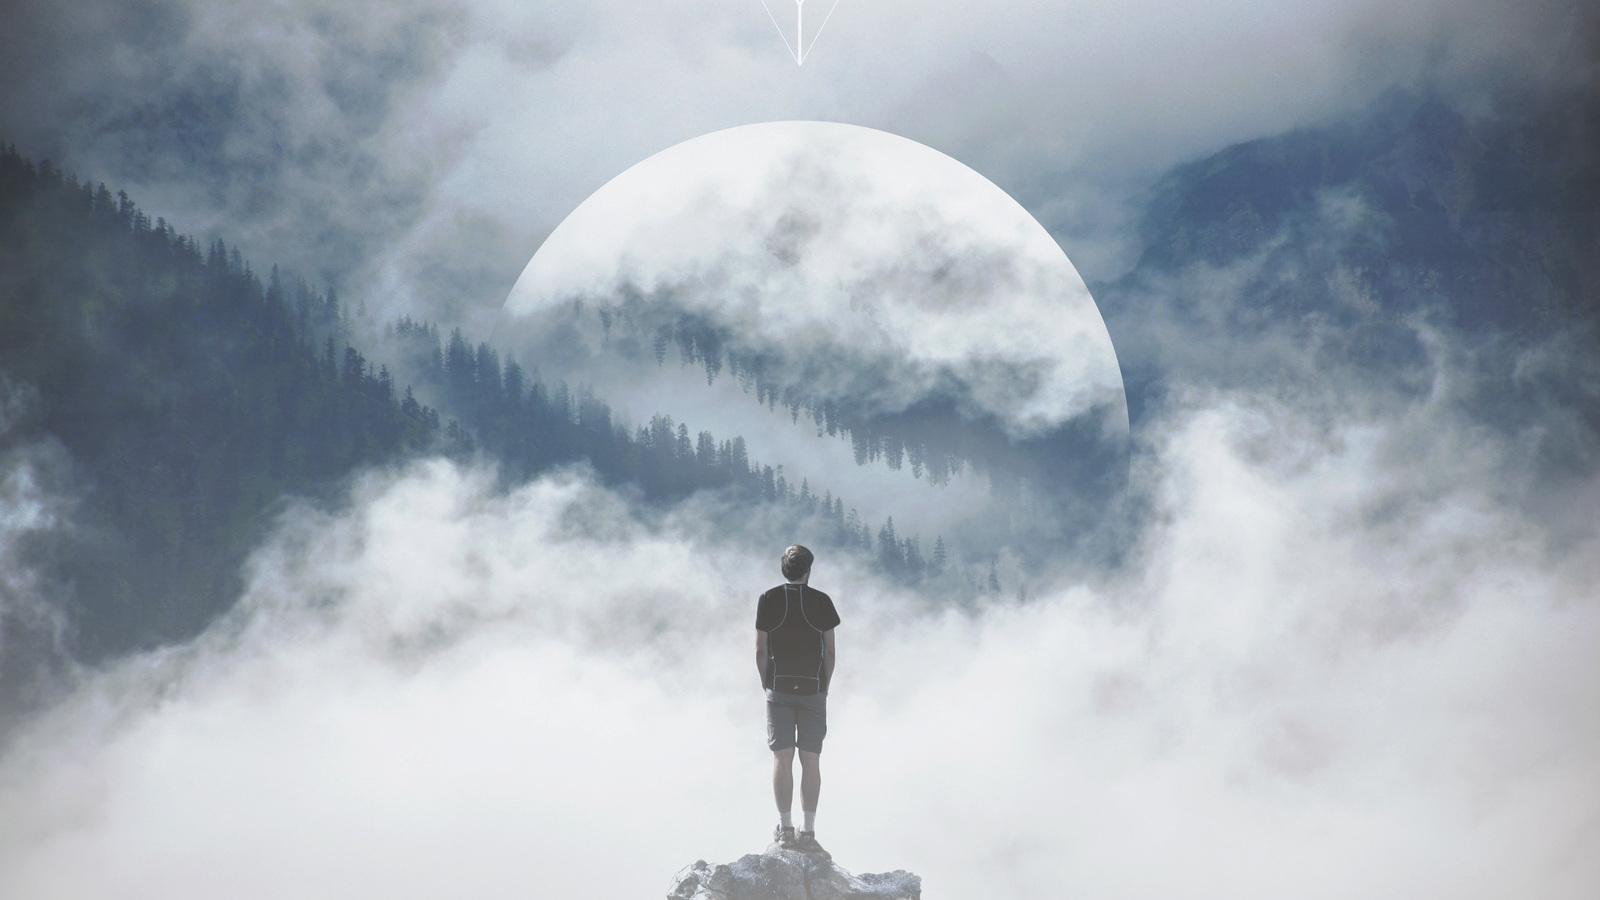 mountain-man-standing-on-rock-manipulation-photography-q6.jpg